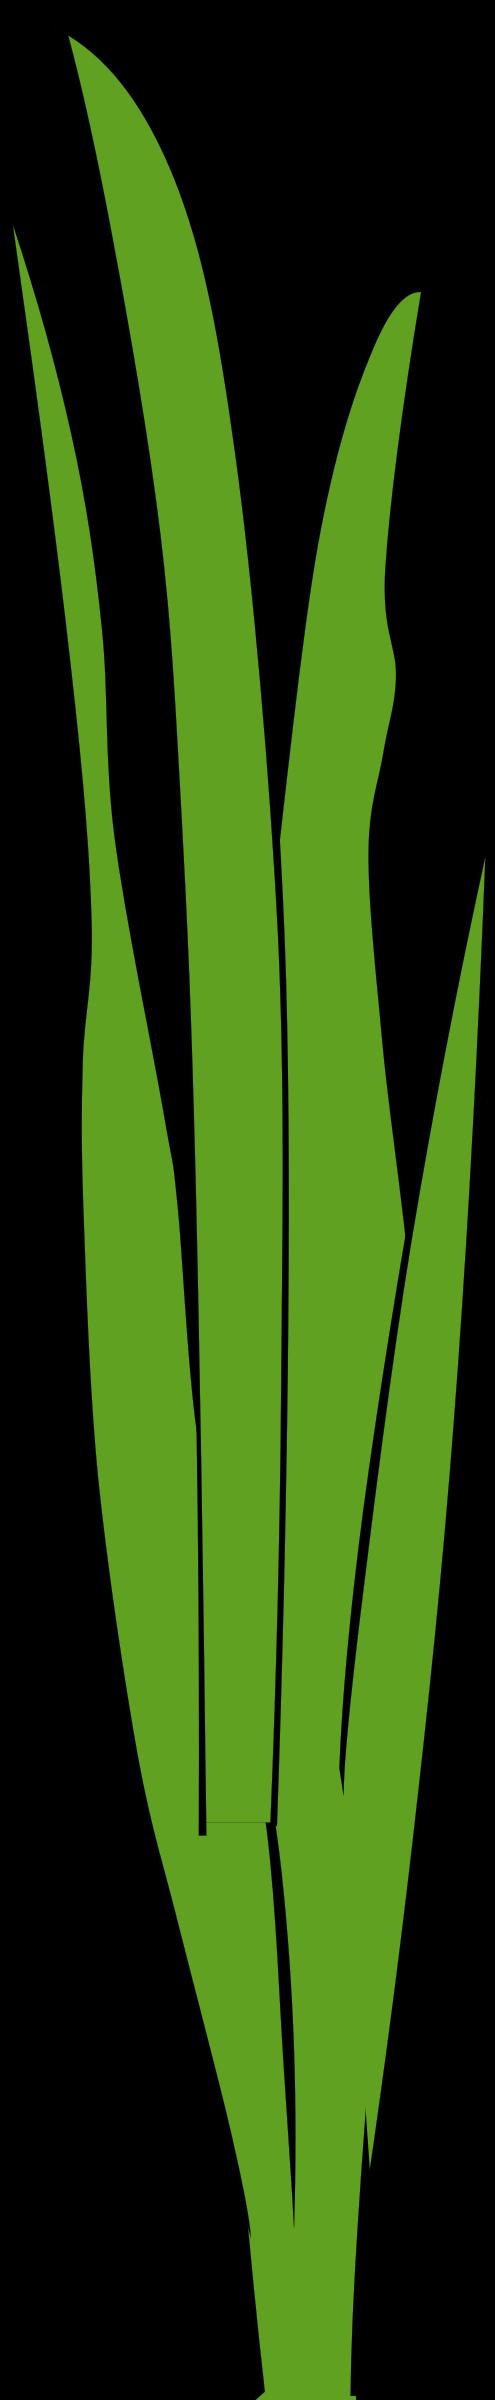 Blade clipart seagrass Blades Clipart sea plants art